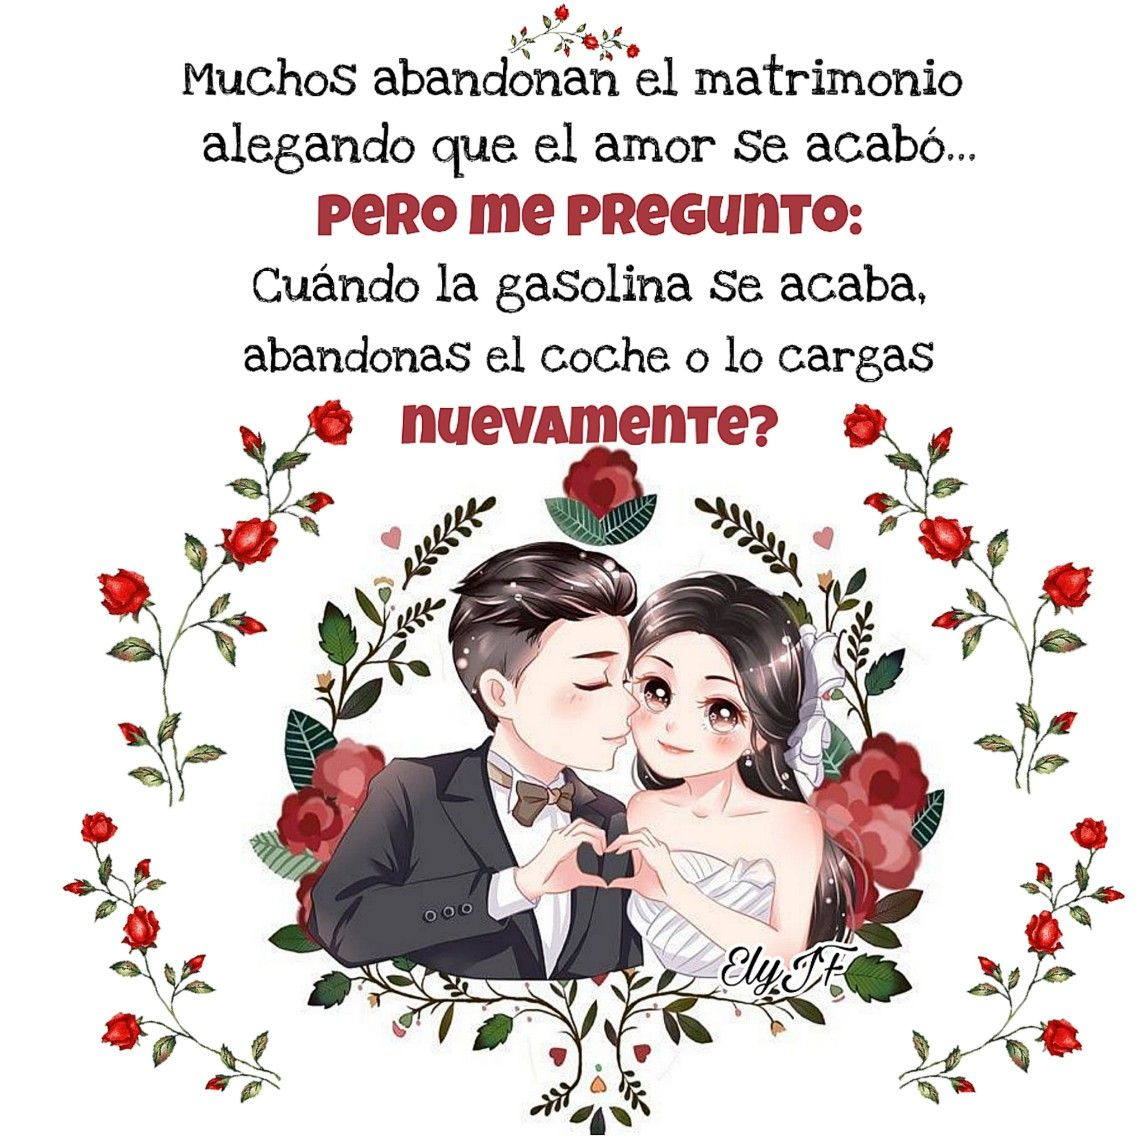 Pin De Ely Javier Franco En Amo A Dios Eternamente Amor Incondicional Matrimonio Amor